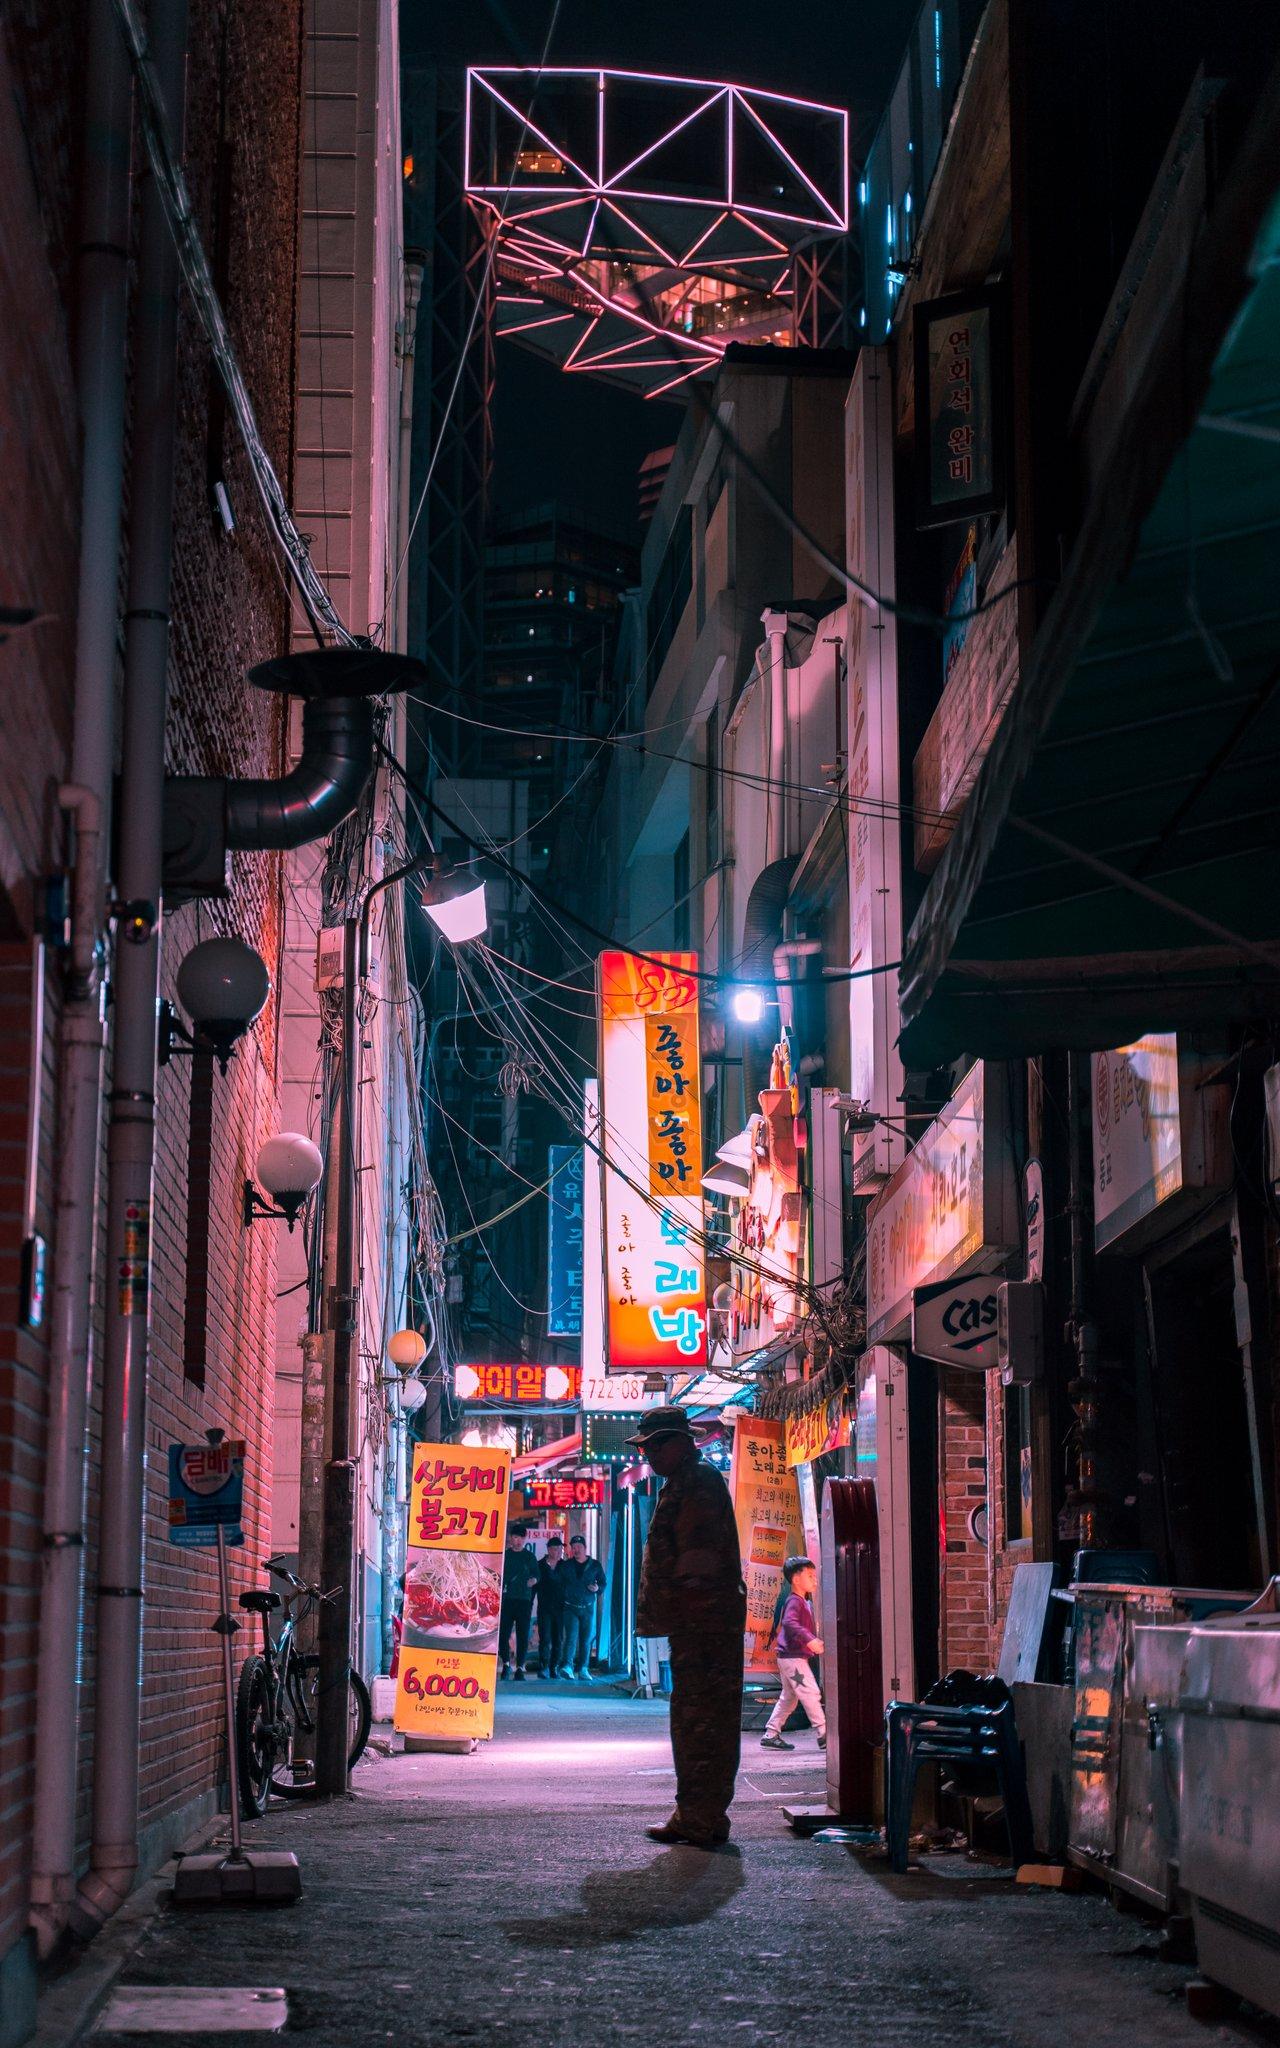 street_photography_29.jpg